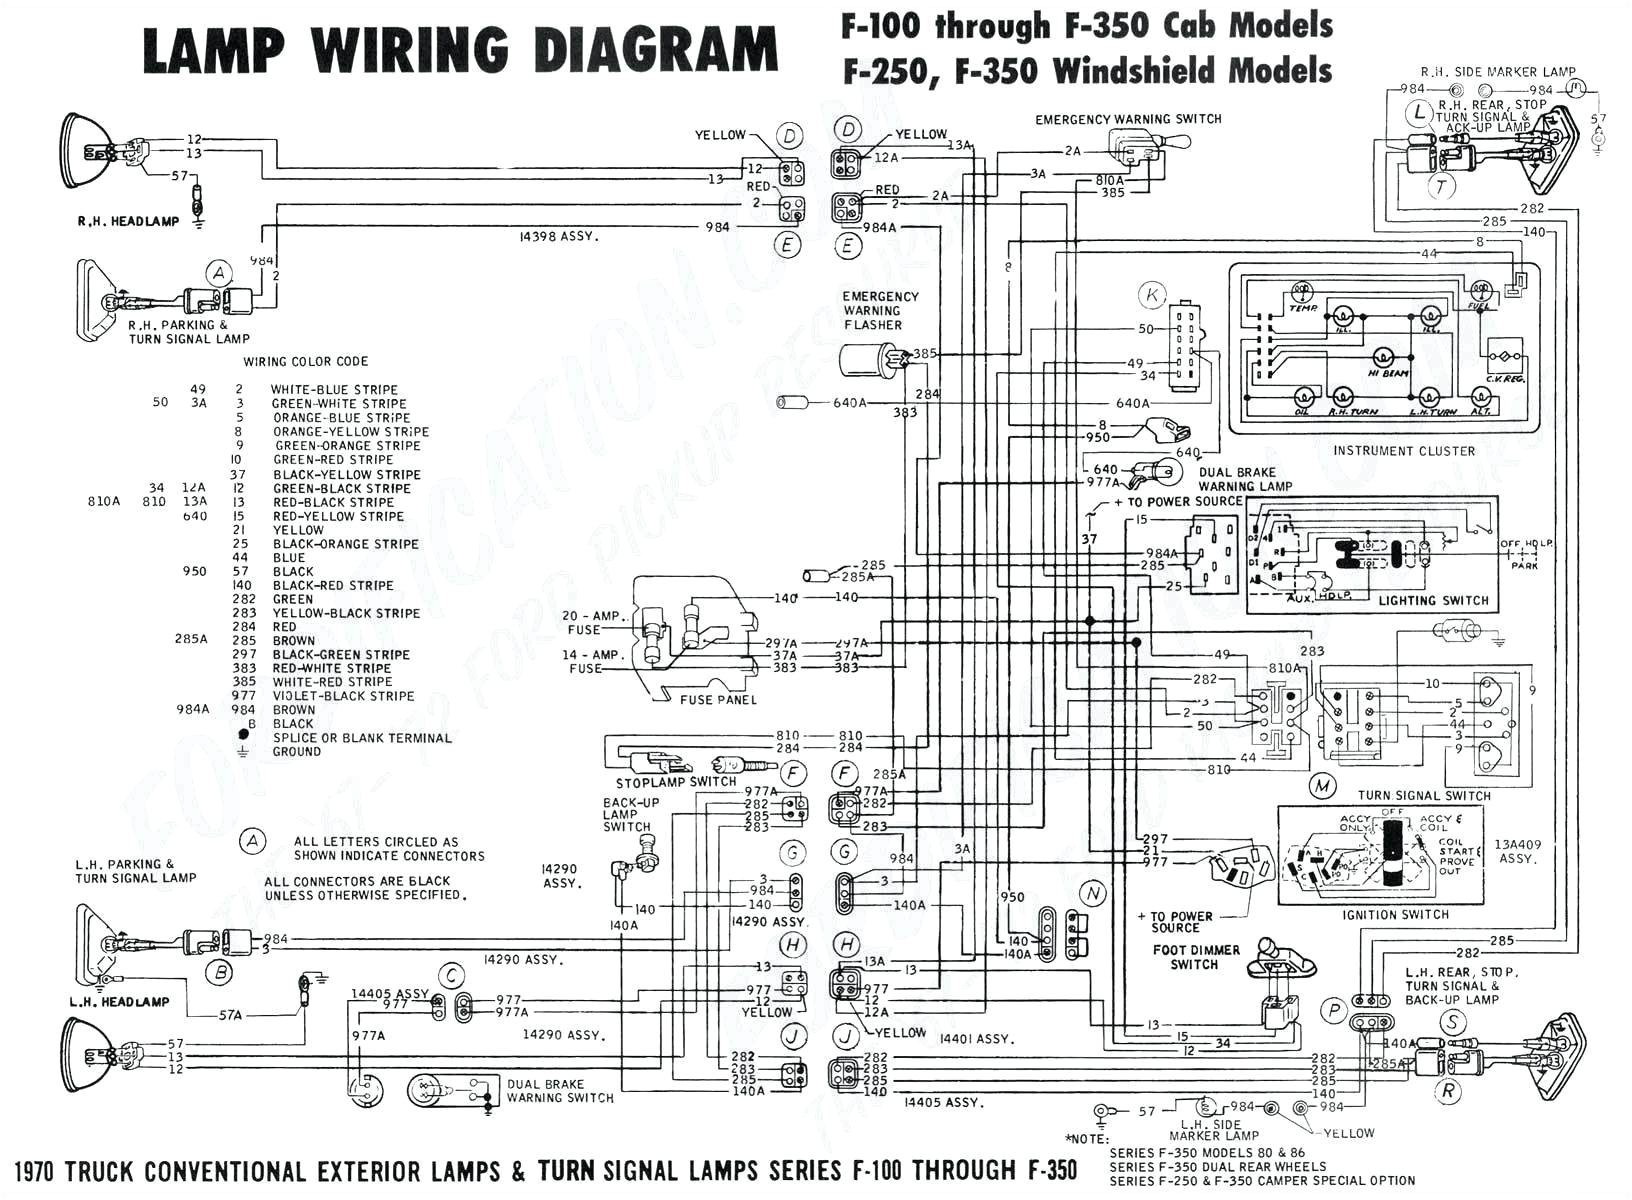 peterbilt 379 headlight wiring diagram inspirational 1987 peterbilt headlight wiring data wiring e280a2 of peterbilt 379 headlight wiring diagram jpg